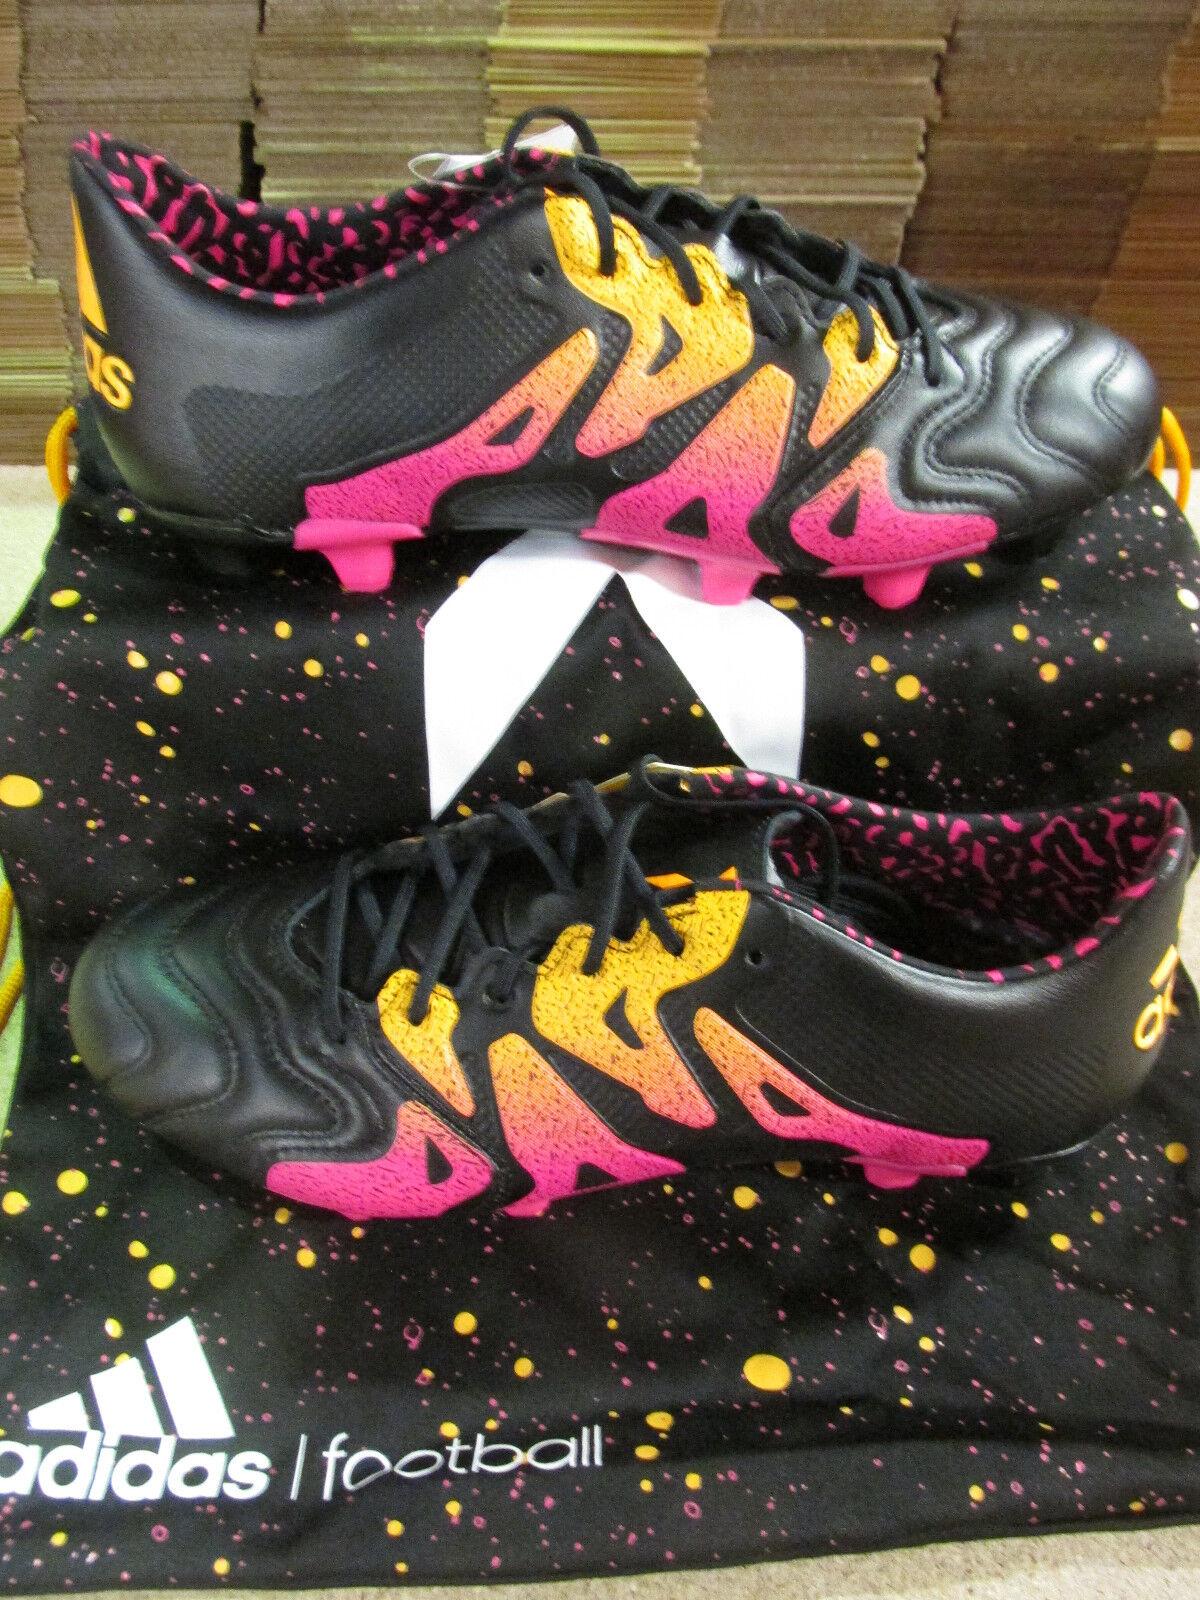 Adidas x 15.1 FgAg pelle Uomo AQ5791 Calcio Tacchetti